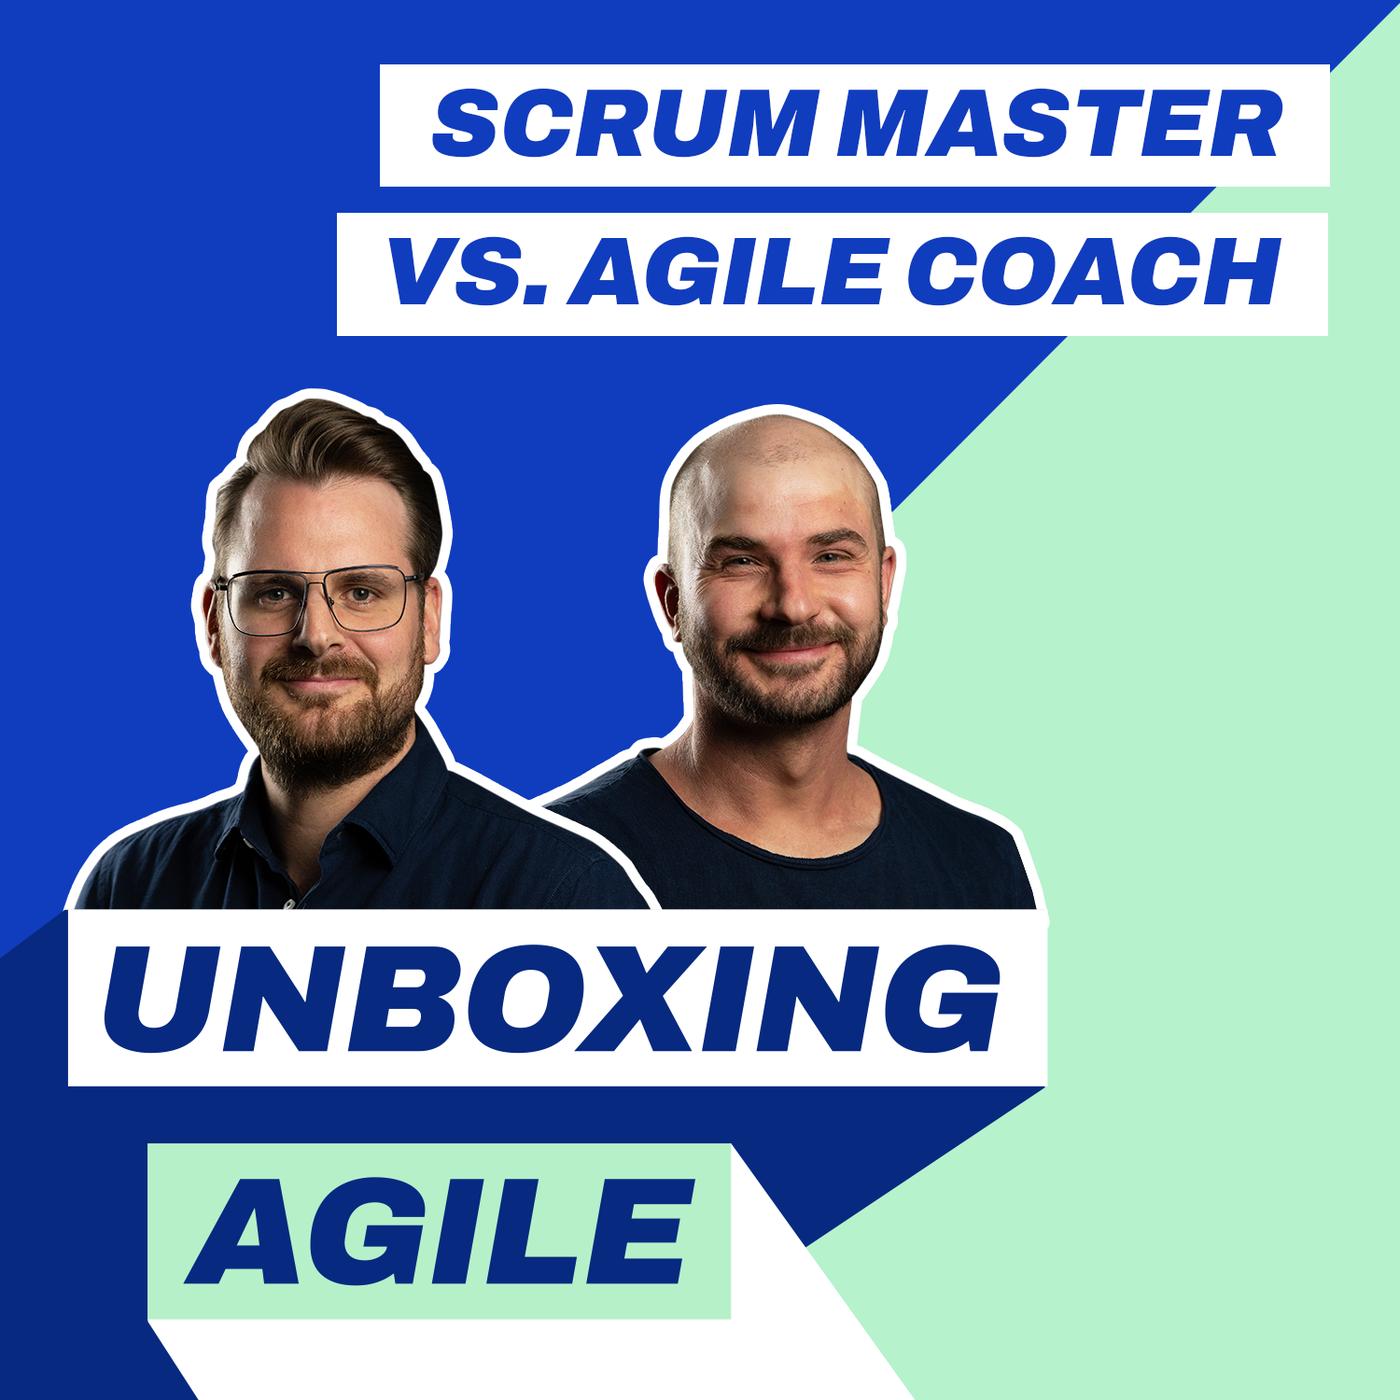 UA057 - Scrum Master vs. Agile Coach: Die Jobs im Vergleich